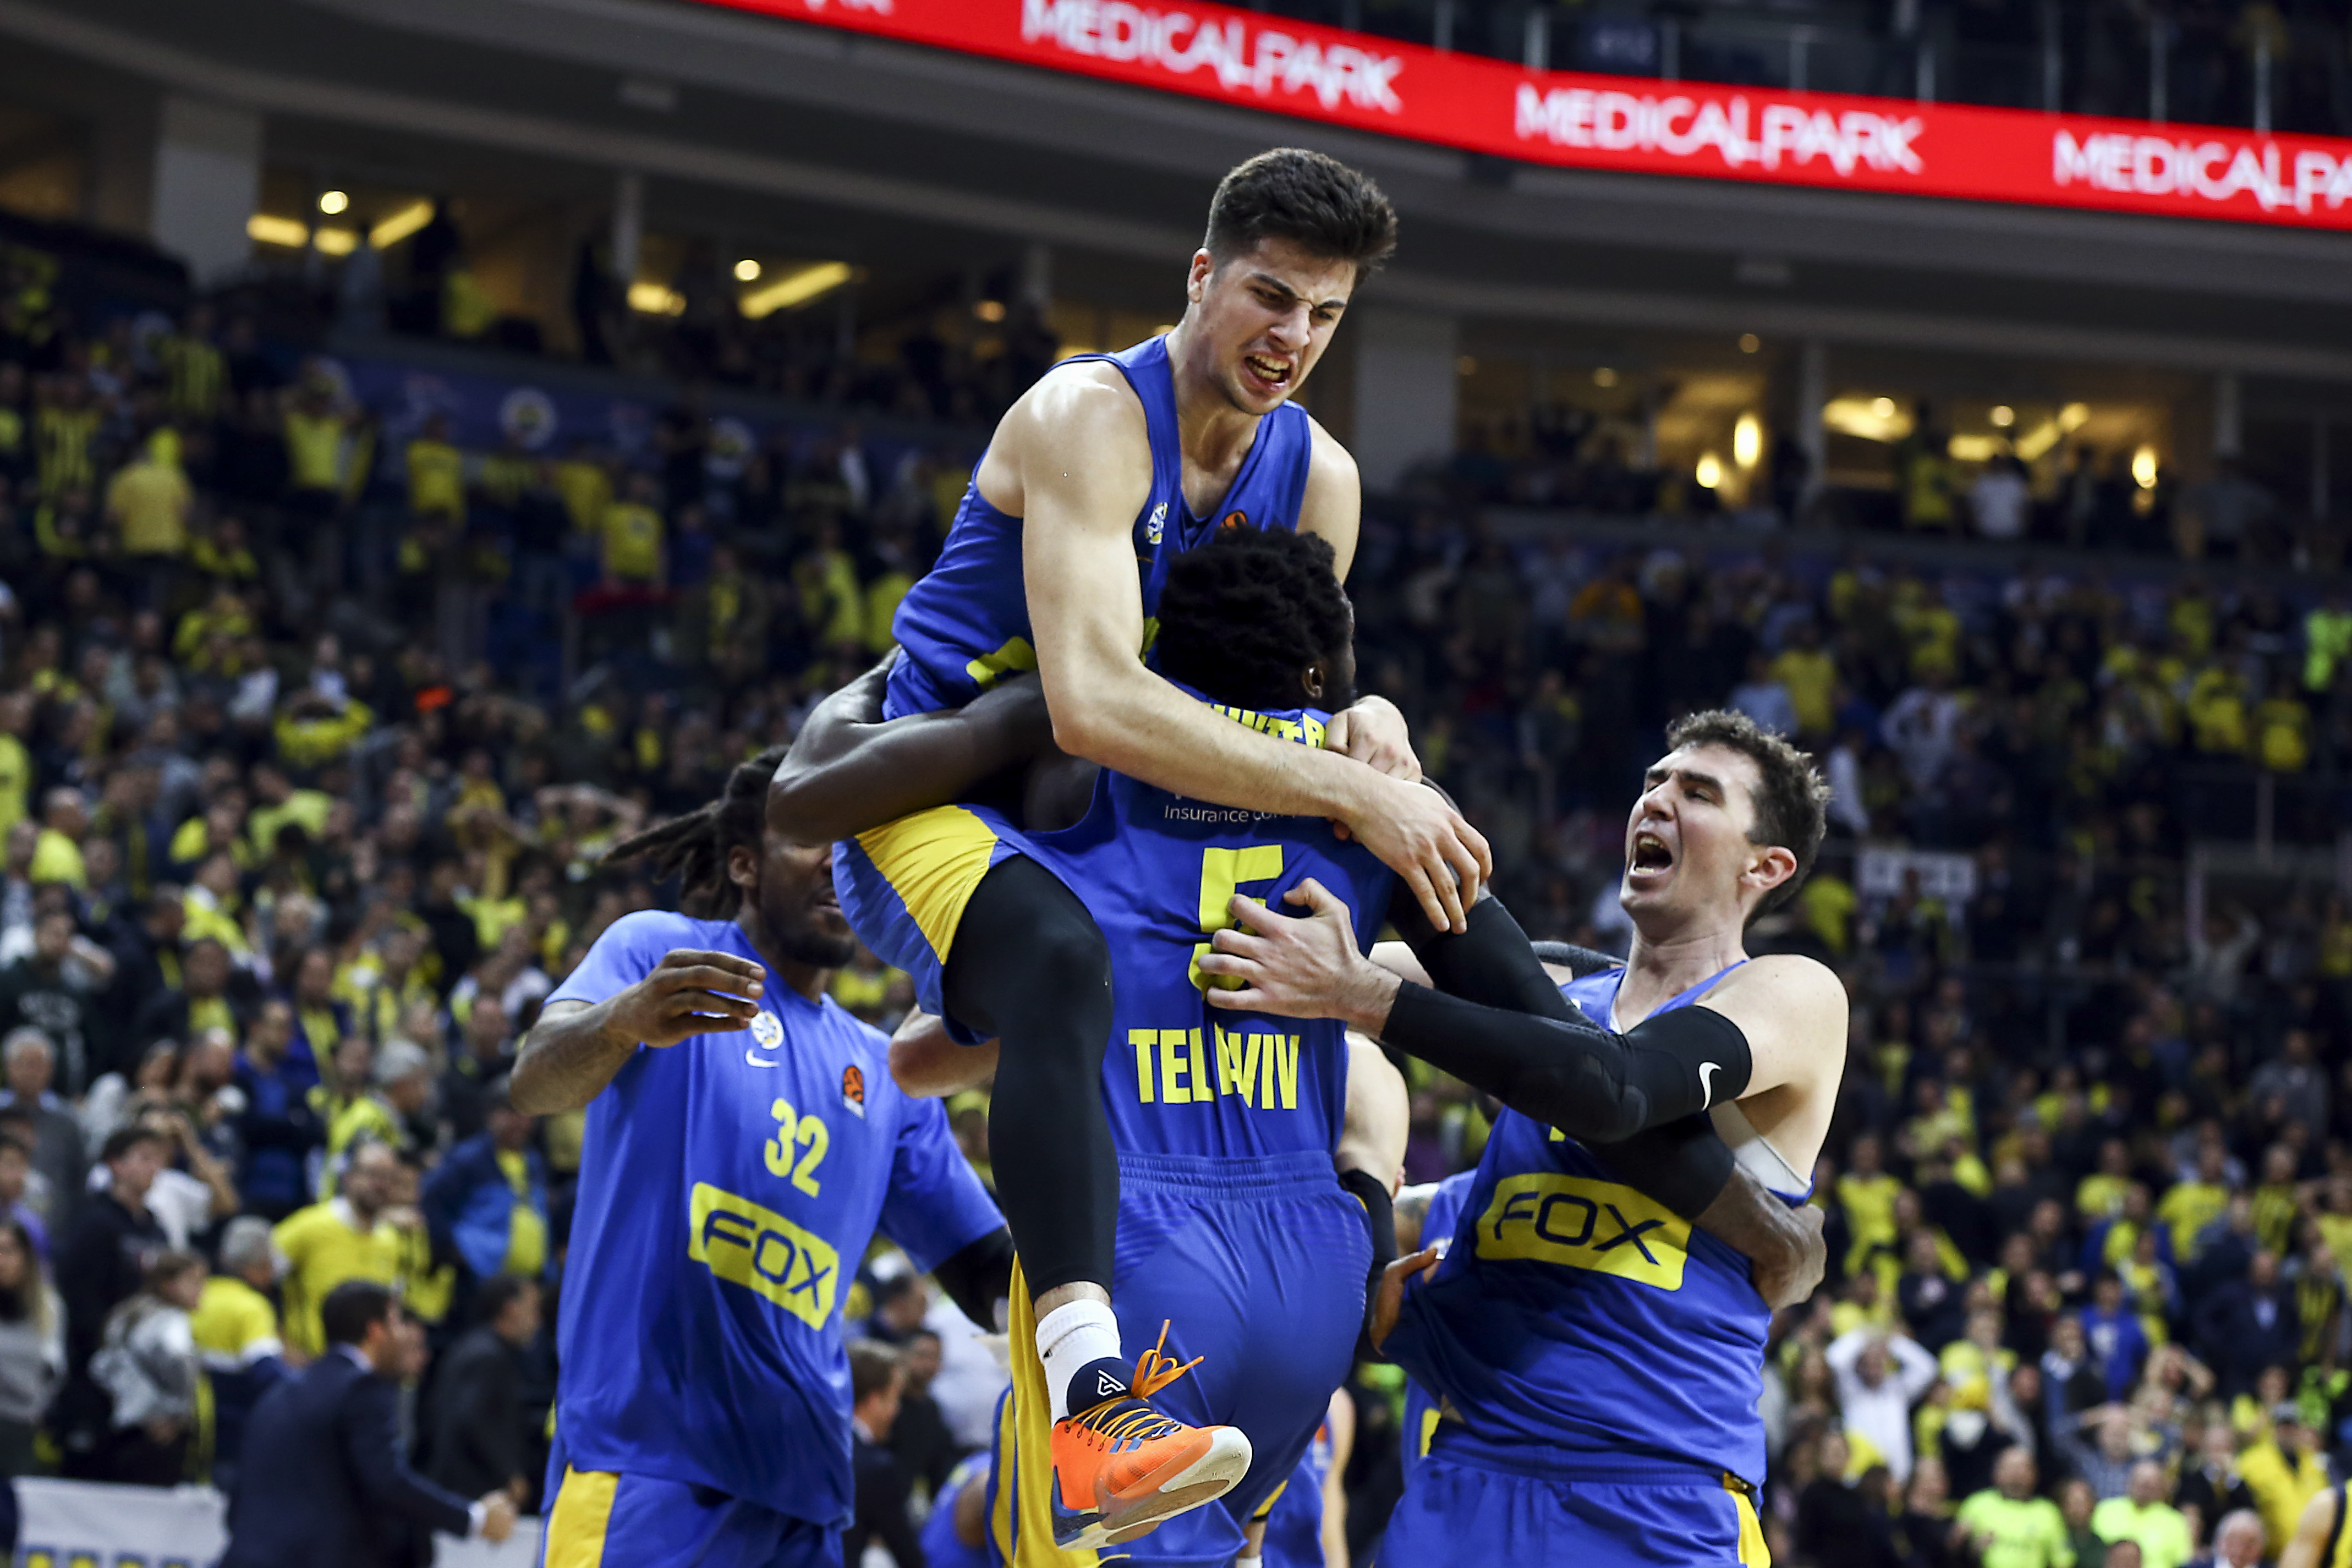 Israeli Basketball Star Deni Avdija Ready For Wizards And Nba The Washington Post